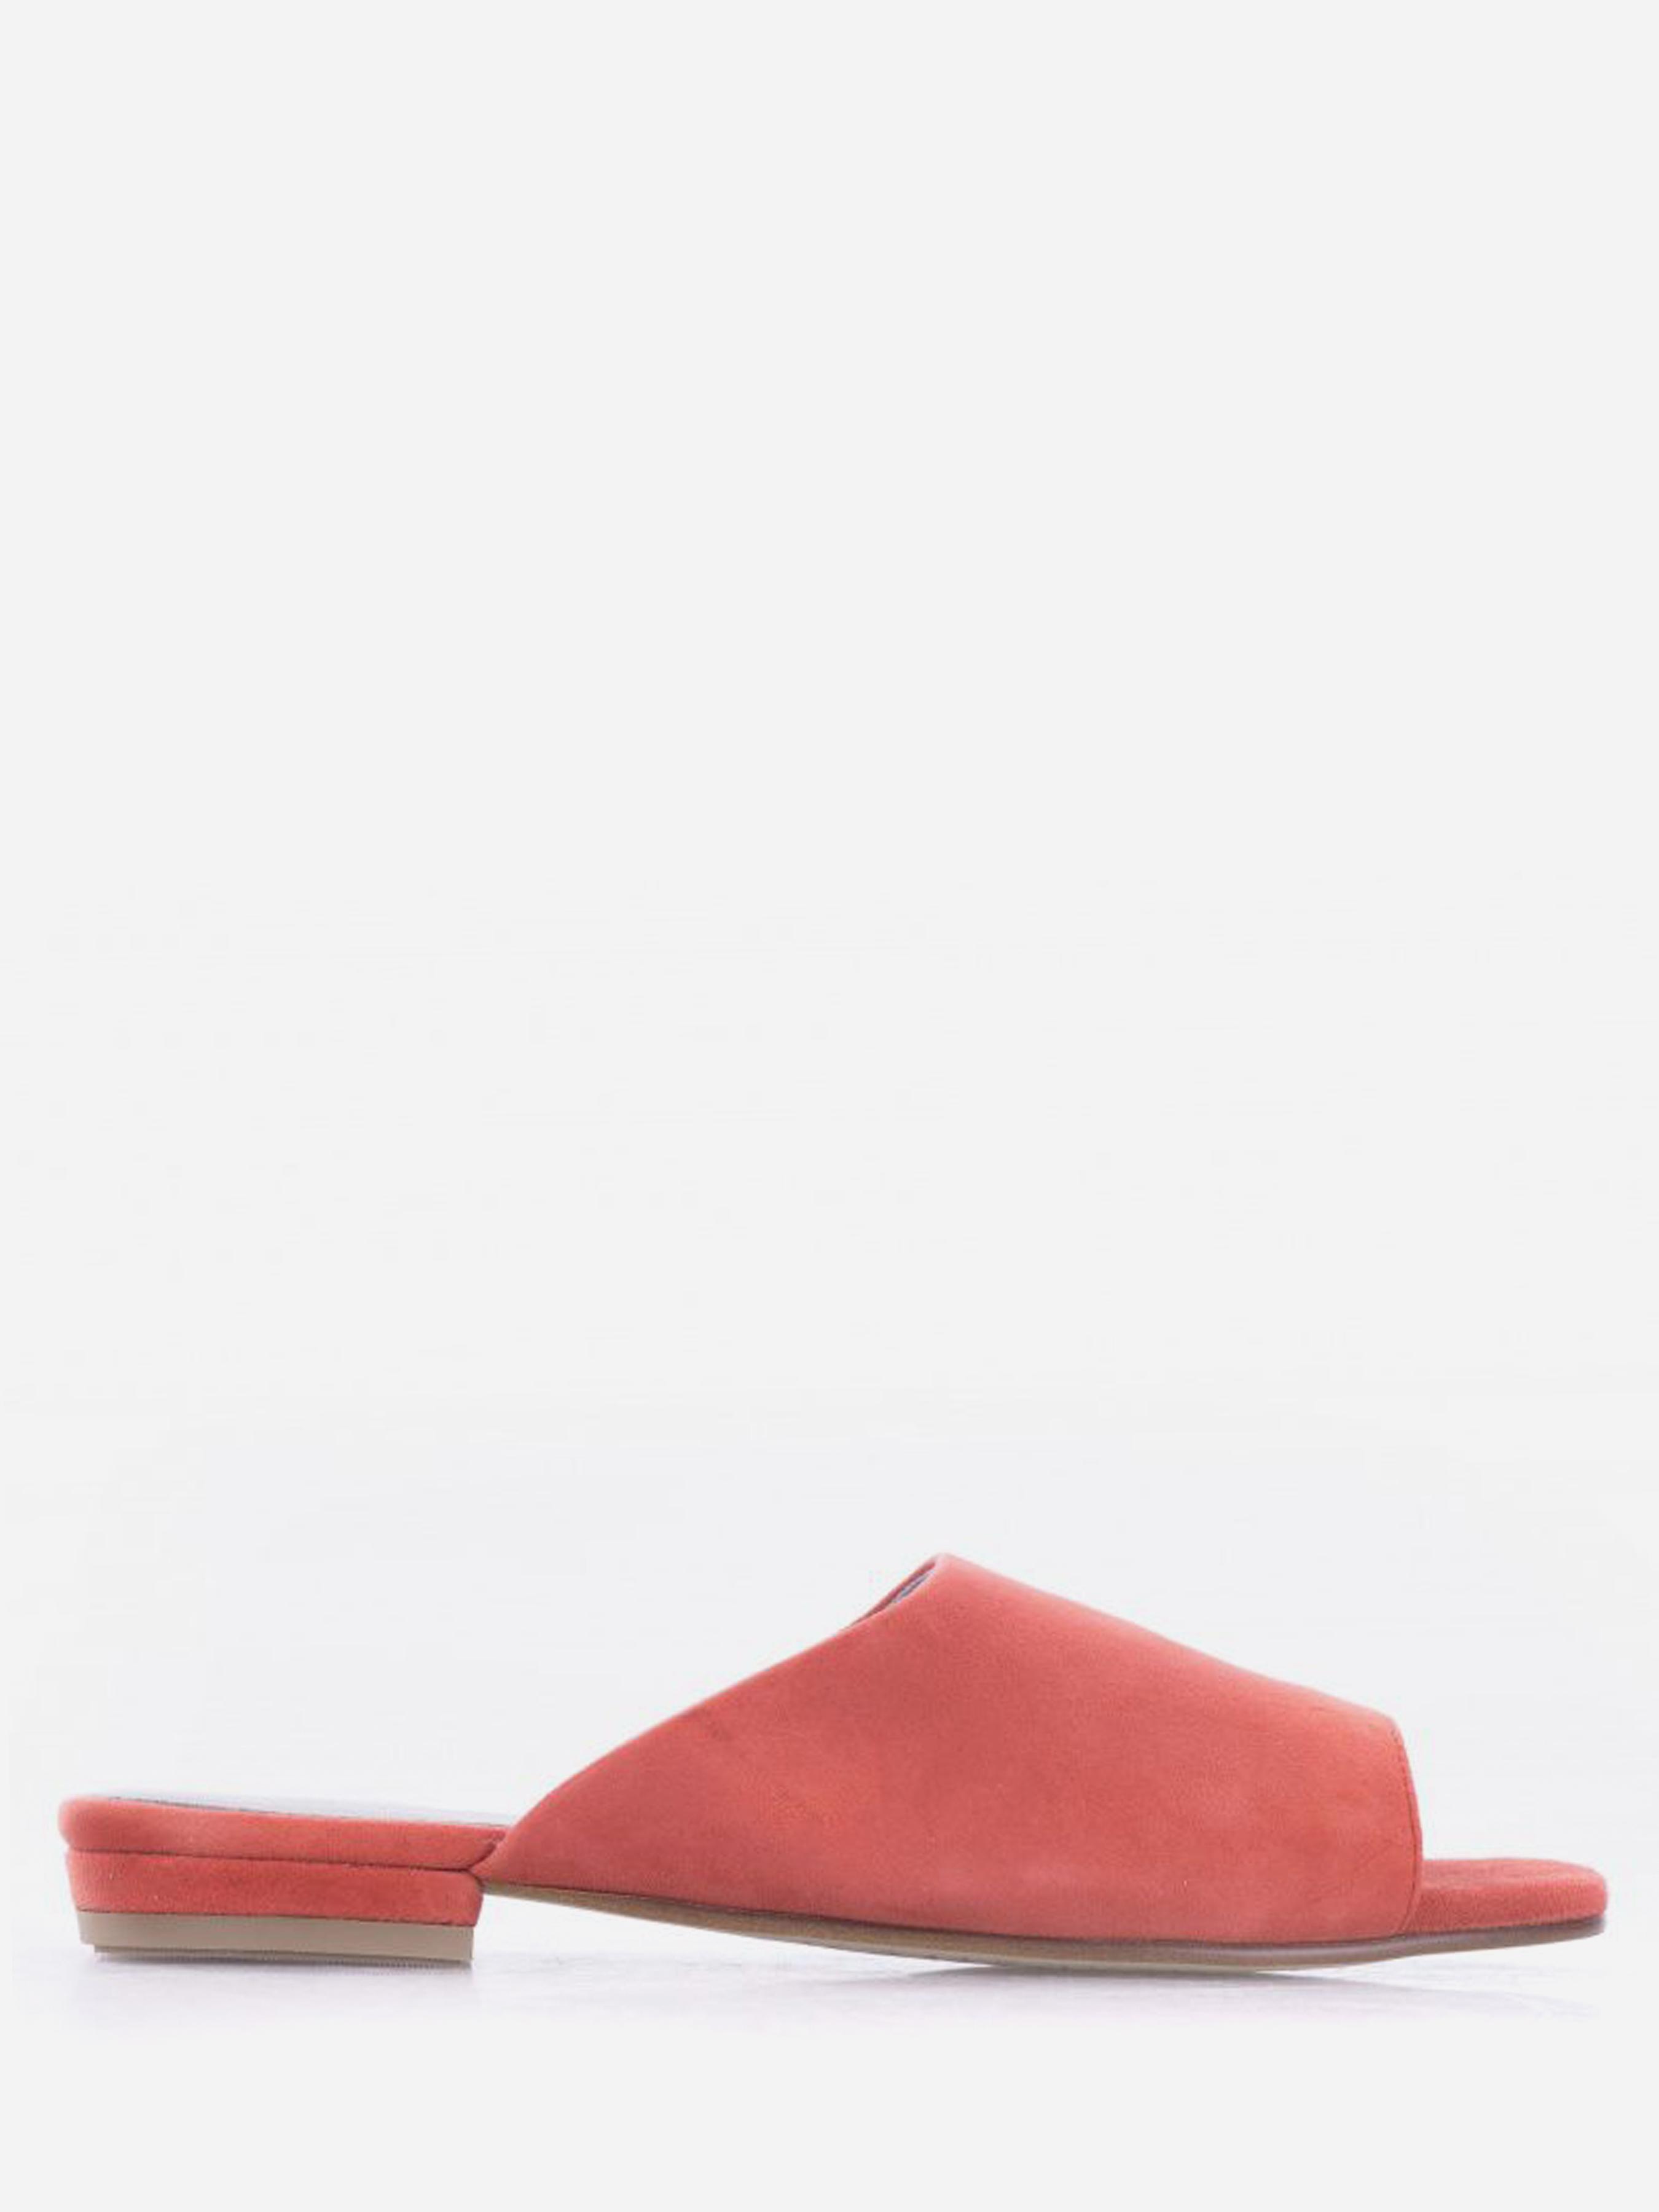 Шлёпанцы женские VAGABOND BECKY VW5343 модная обувь, 2017